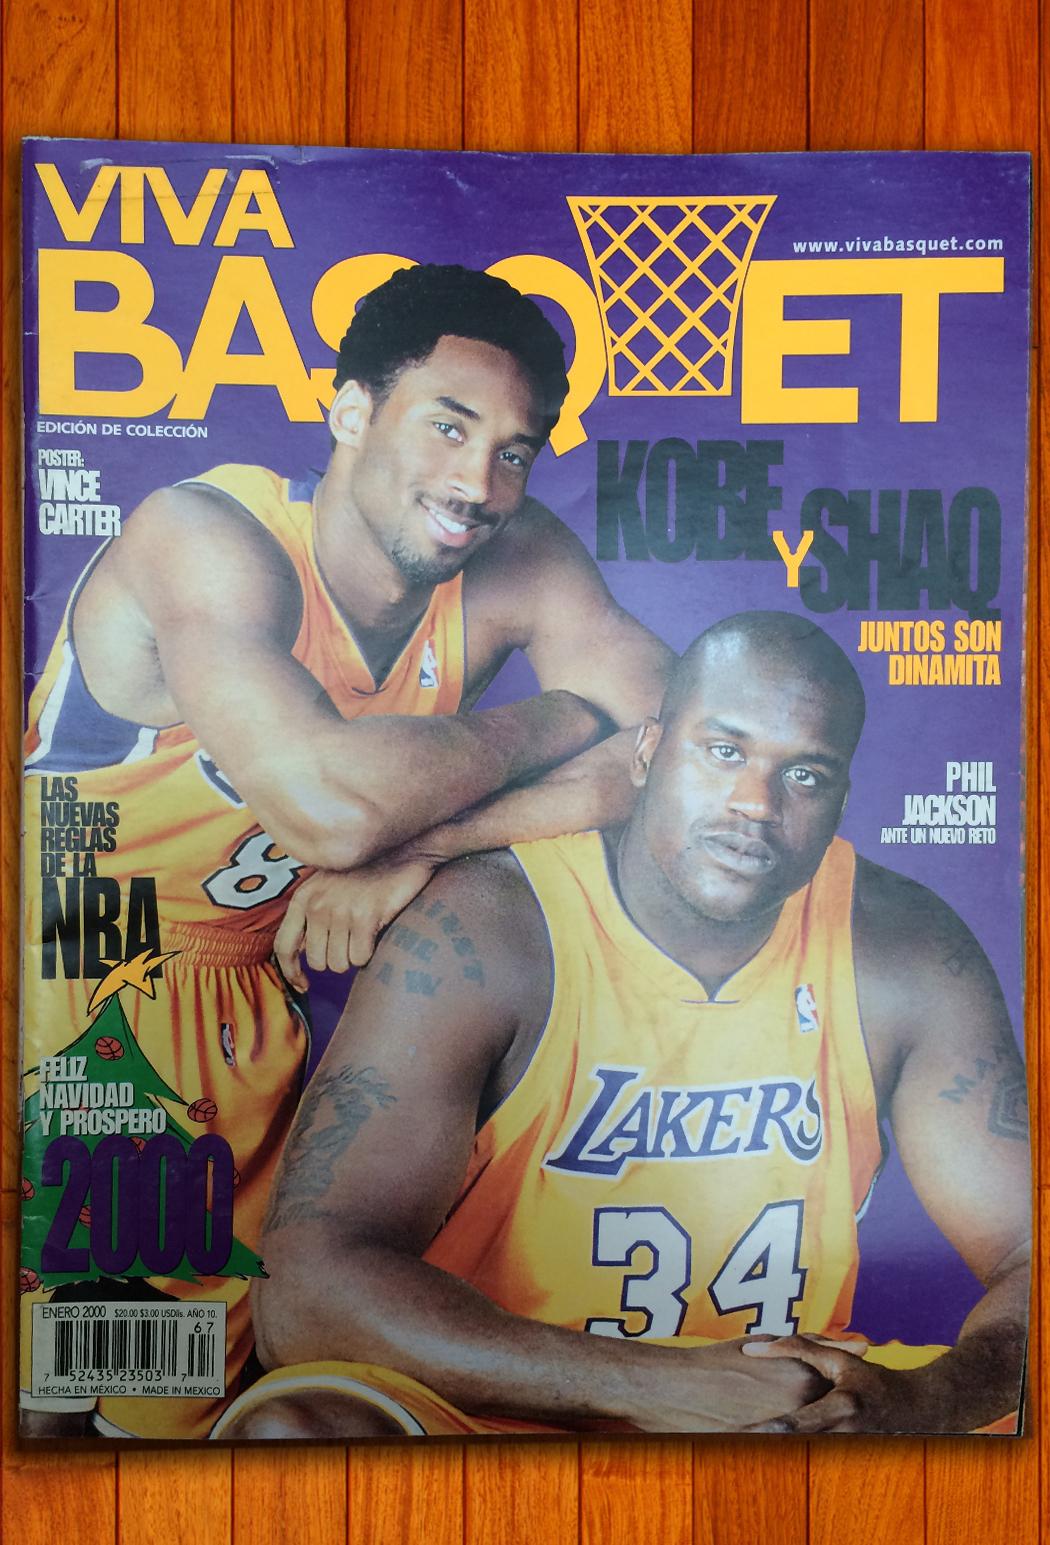 Kobe Bryant en viva basquet foto 2